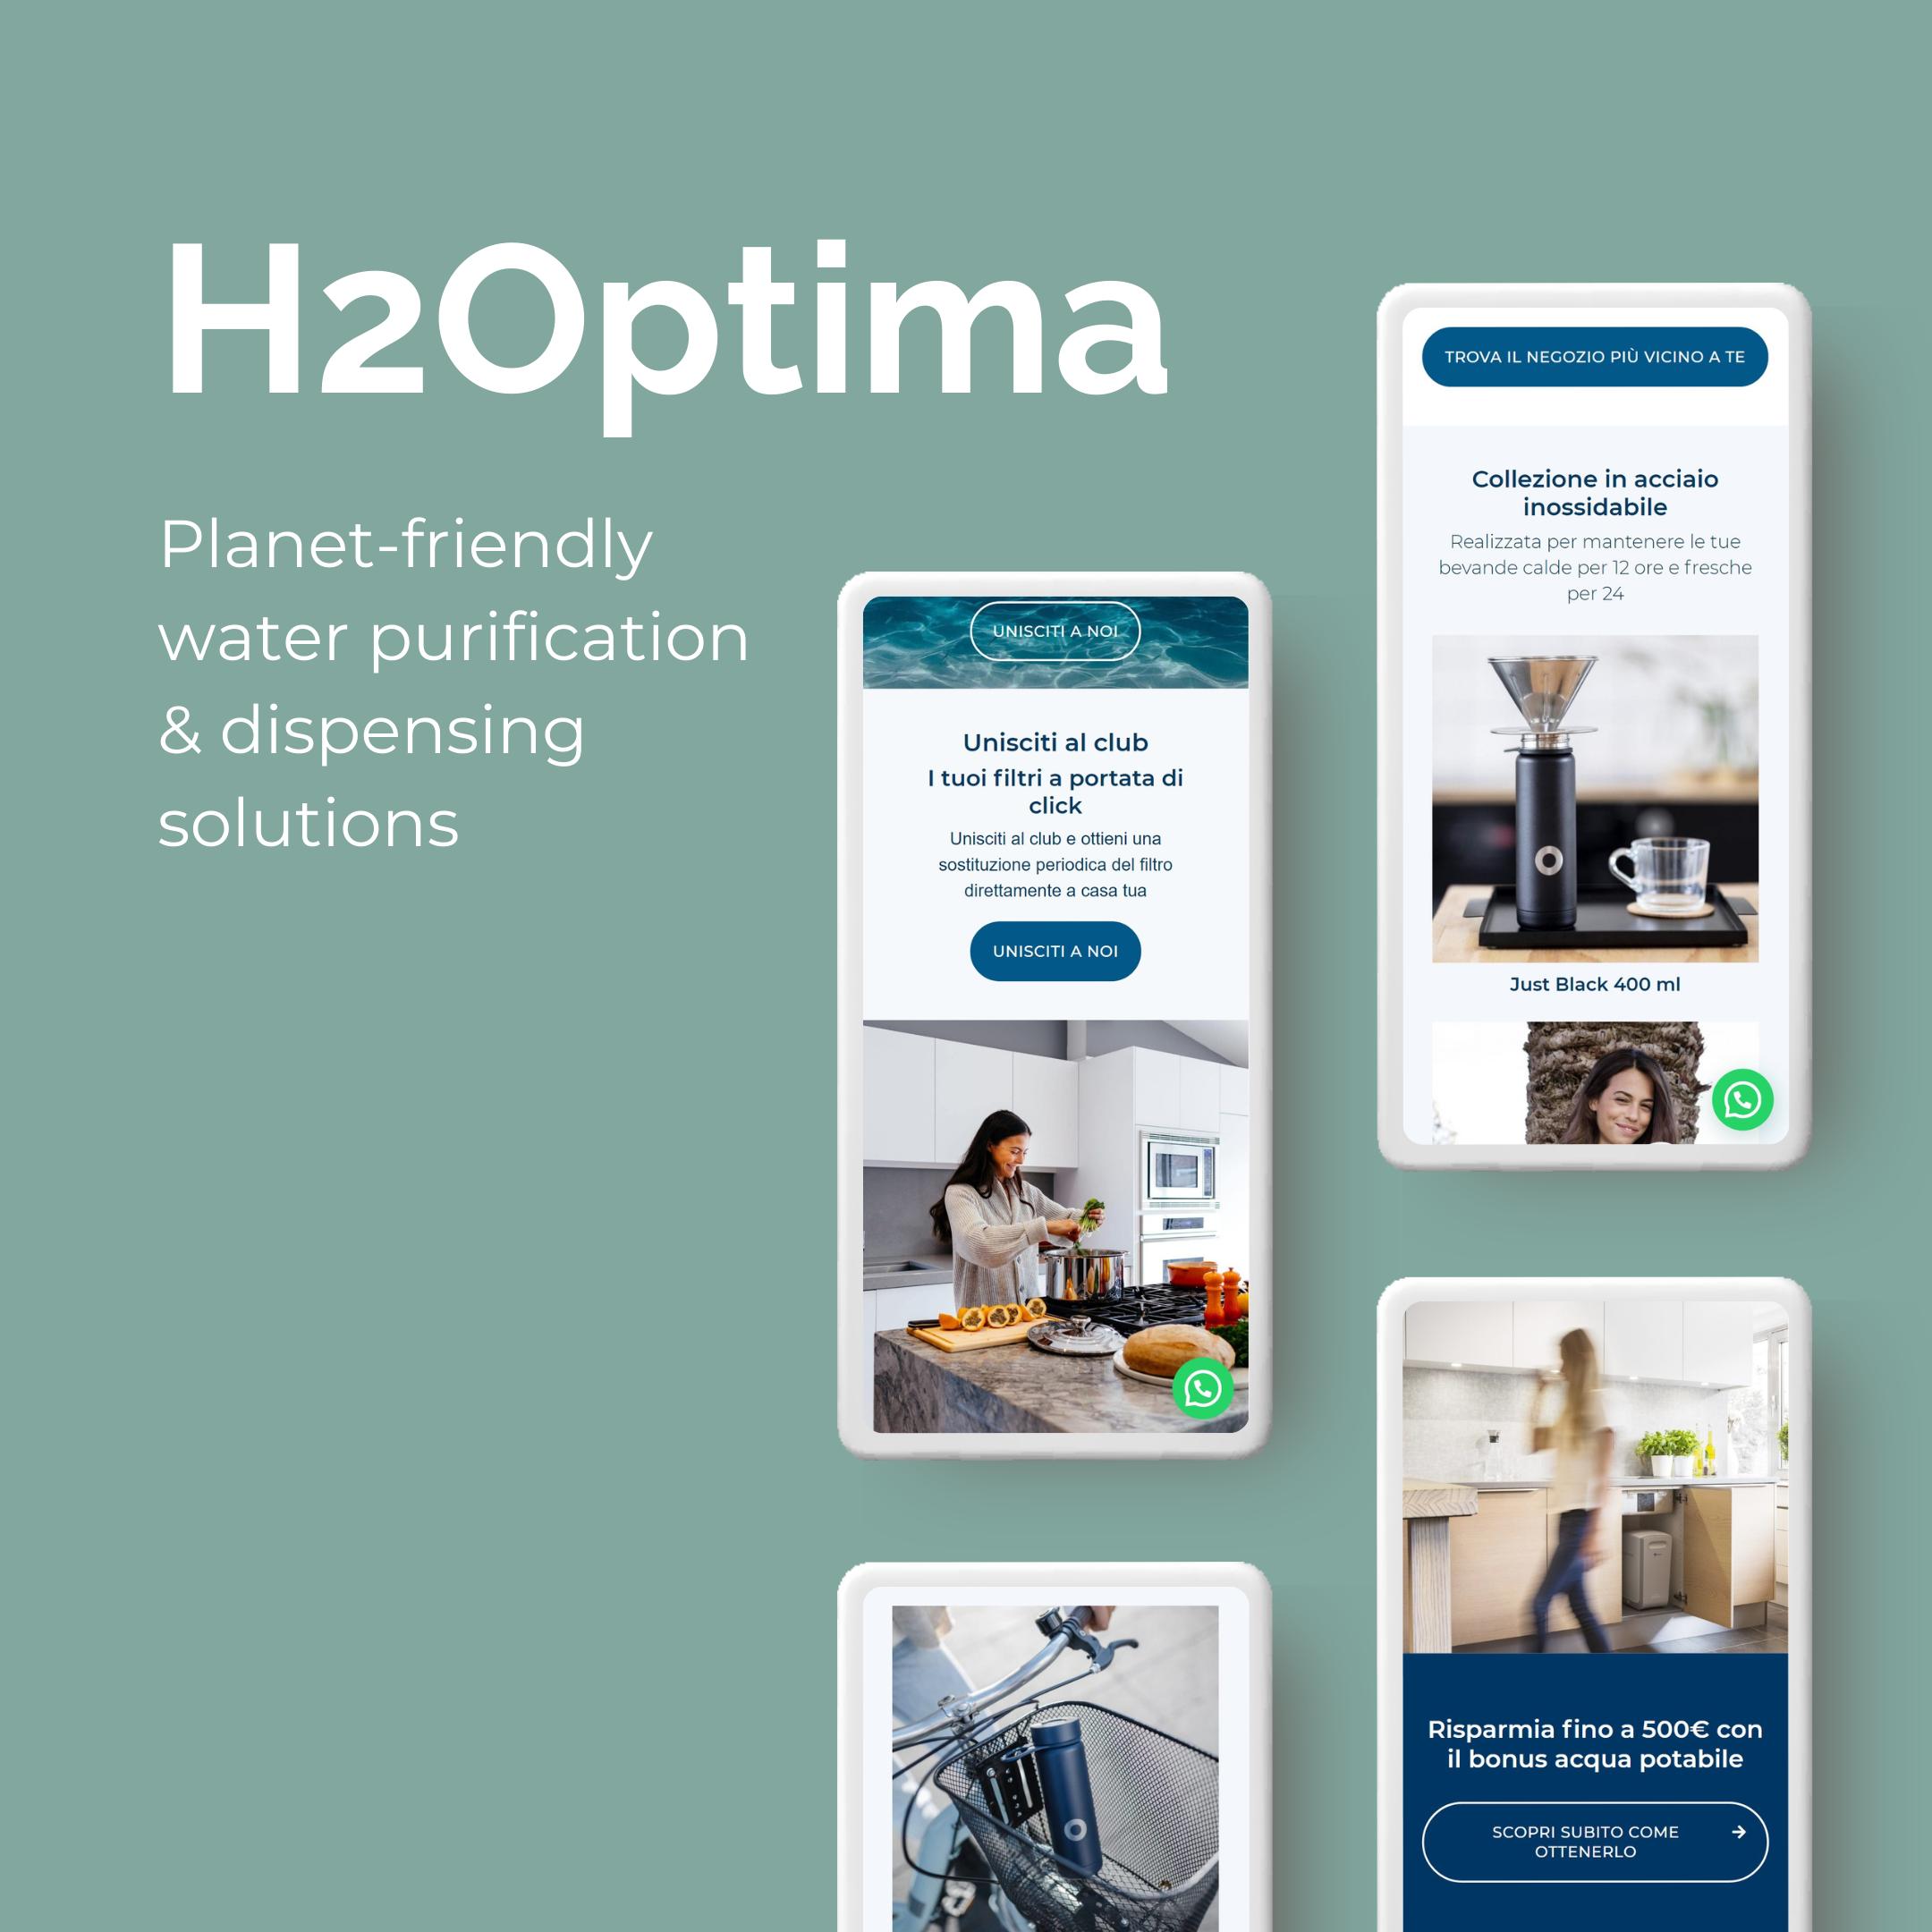 H2Optima